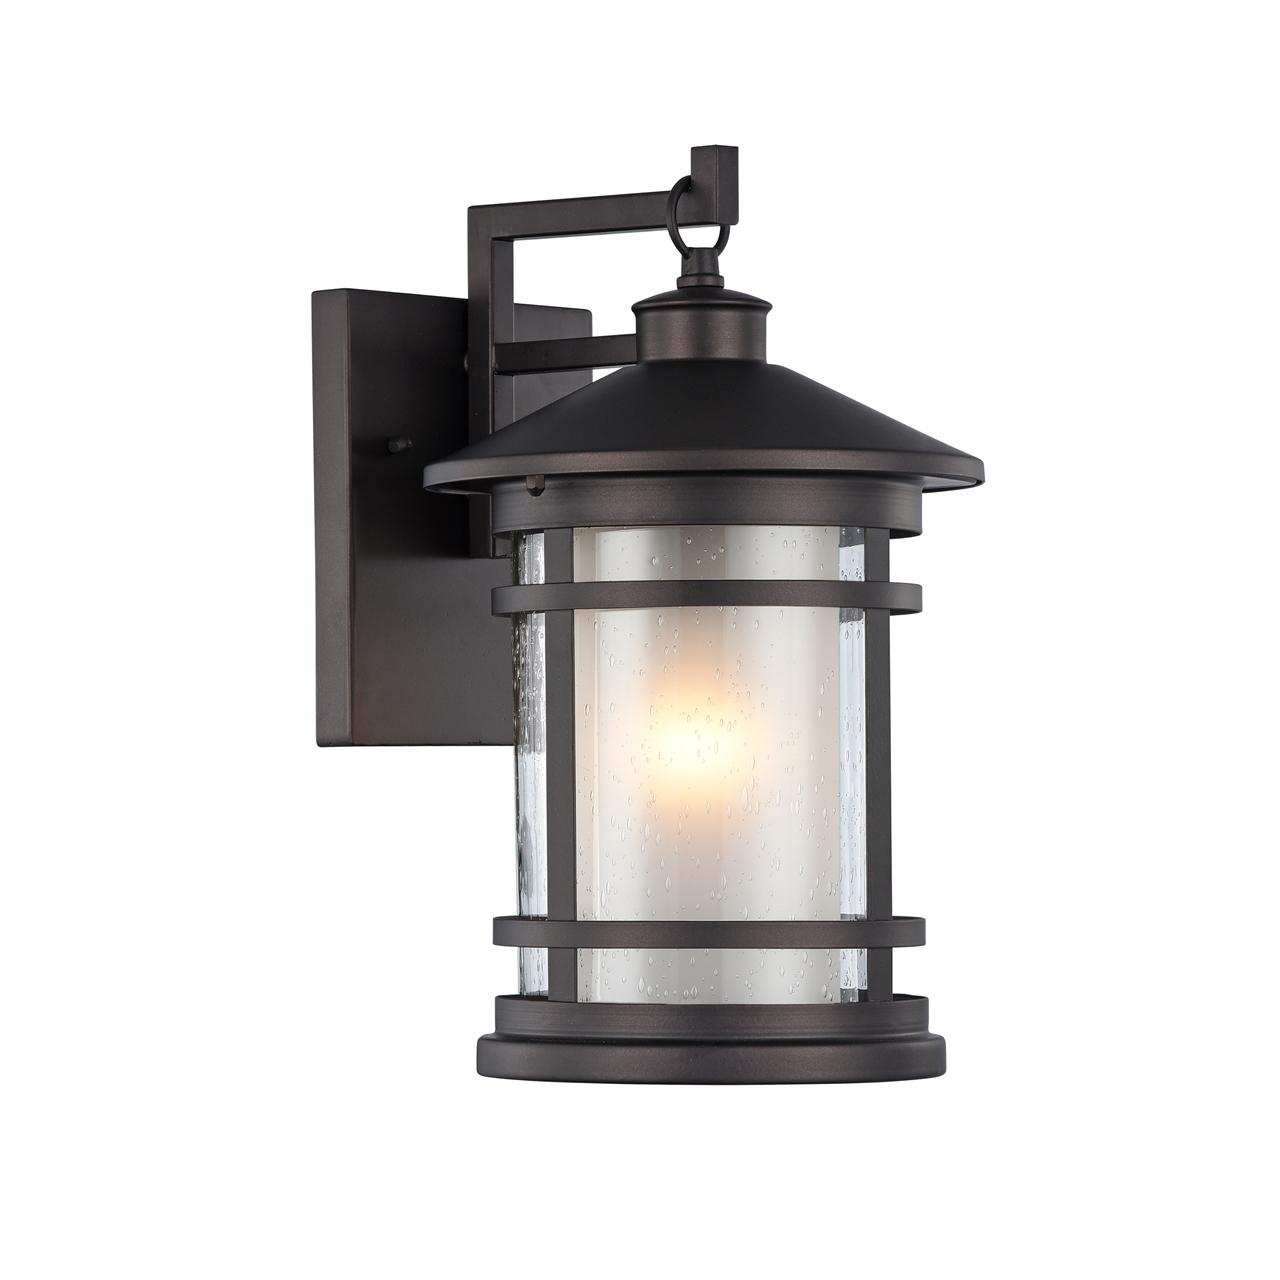 Patio String Lights In Bulk : wholesale outdoor lights - 28 images - wholesale outdoor lighting buy wholesale vintage outdoor ...